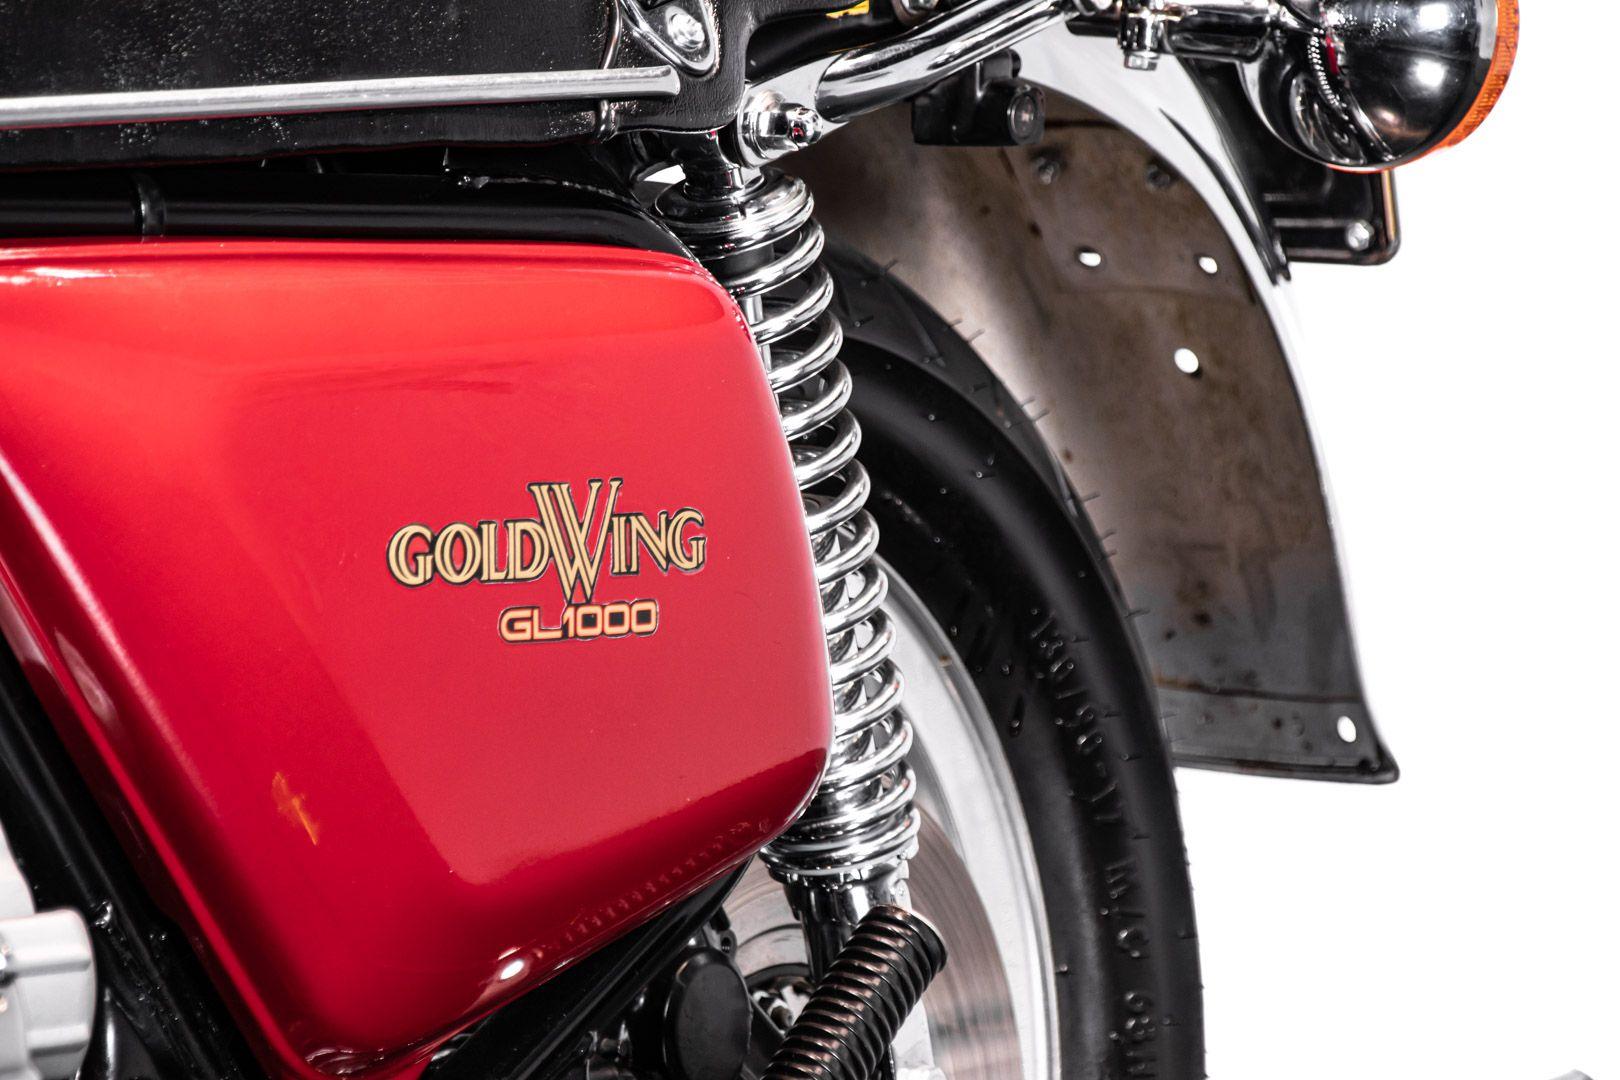 1976 Honda GL 1000 Goldwing 82880